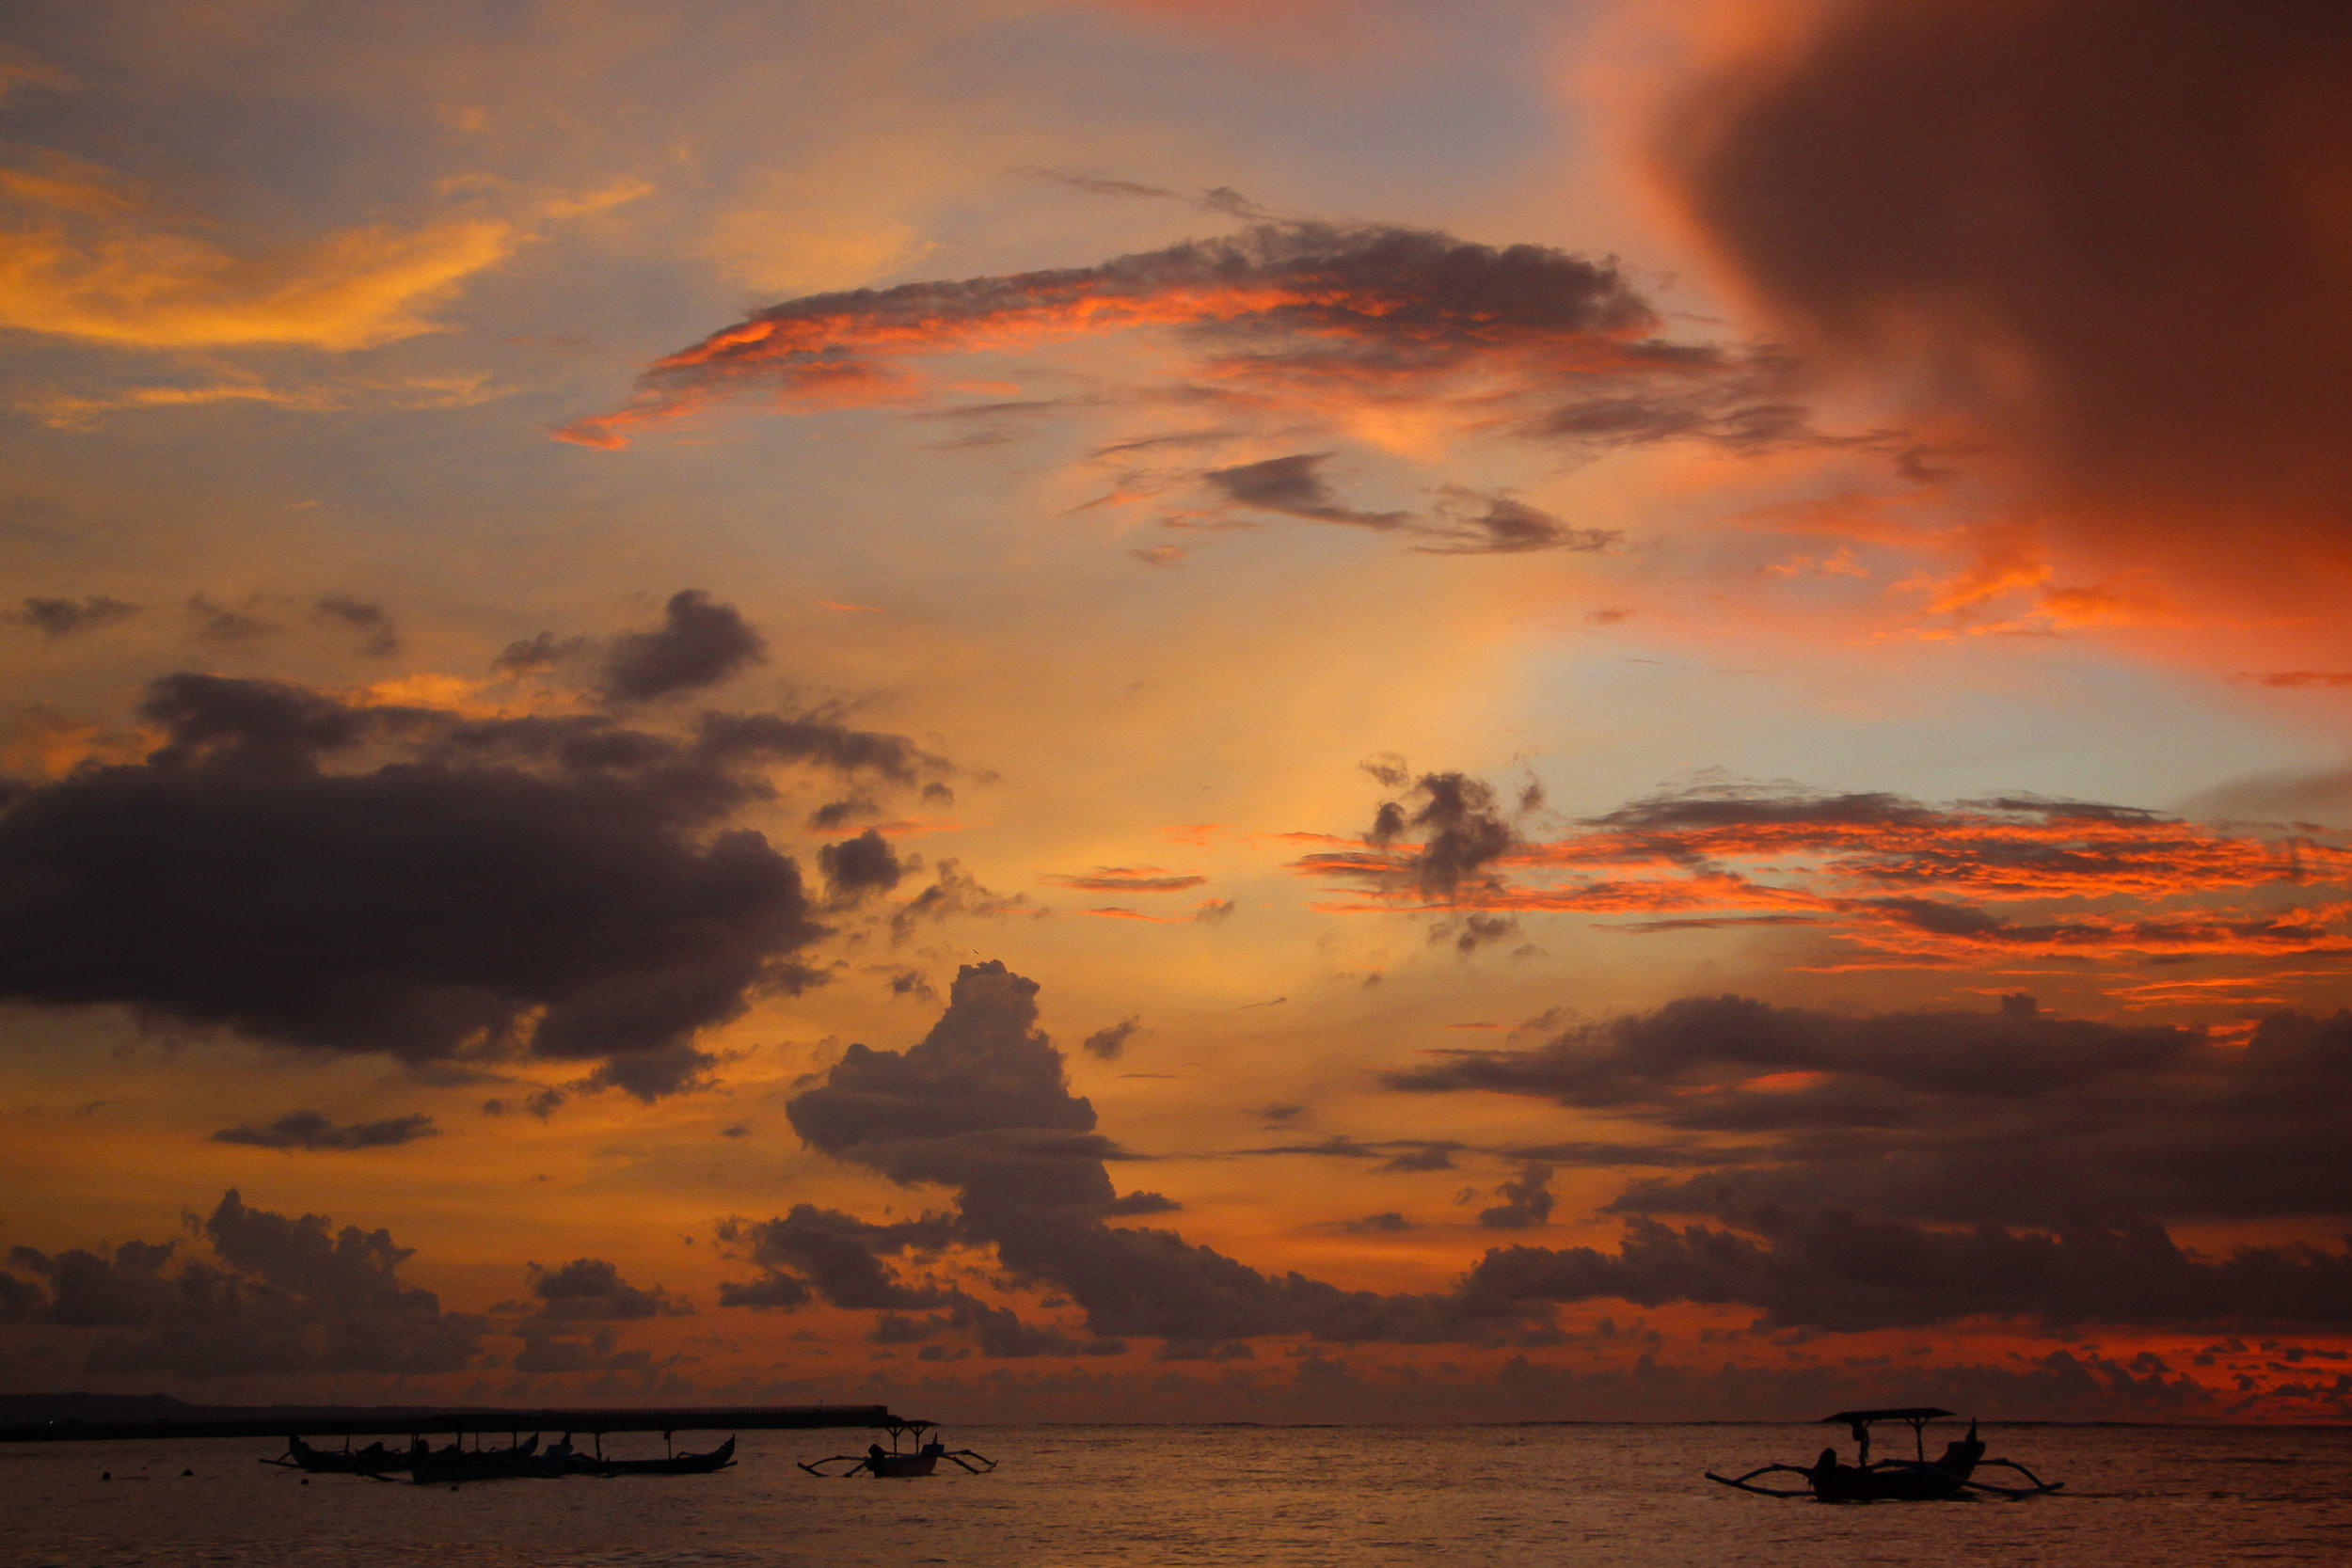 sunset, sky, clouds, sea, fishing boat, Bali, Indonesia, Asia | DoLessGetMoreDone.com |